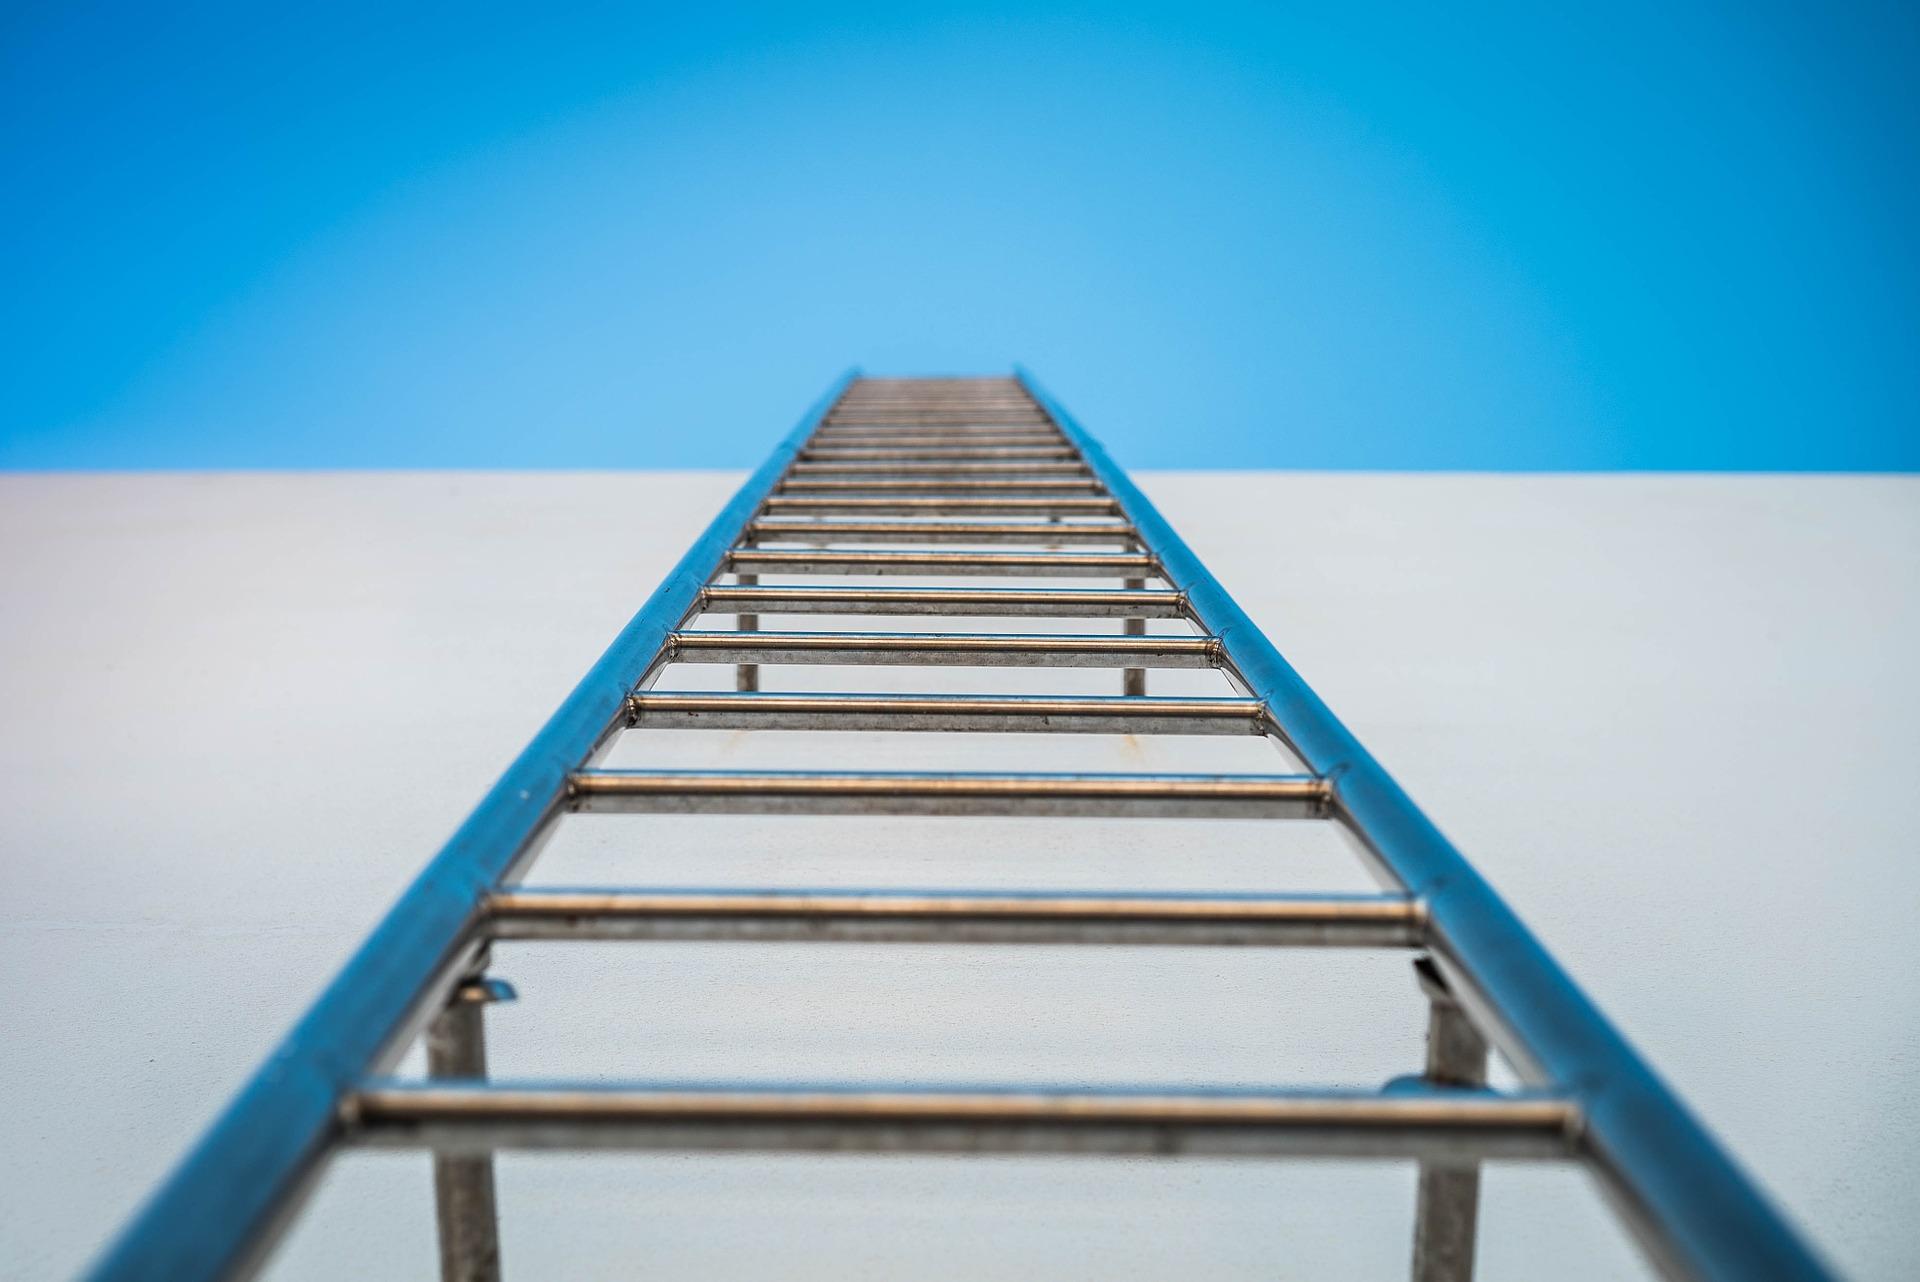 ladder-632939_1920.jpg